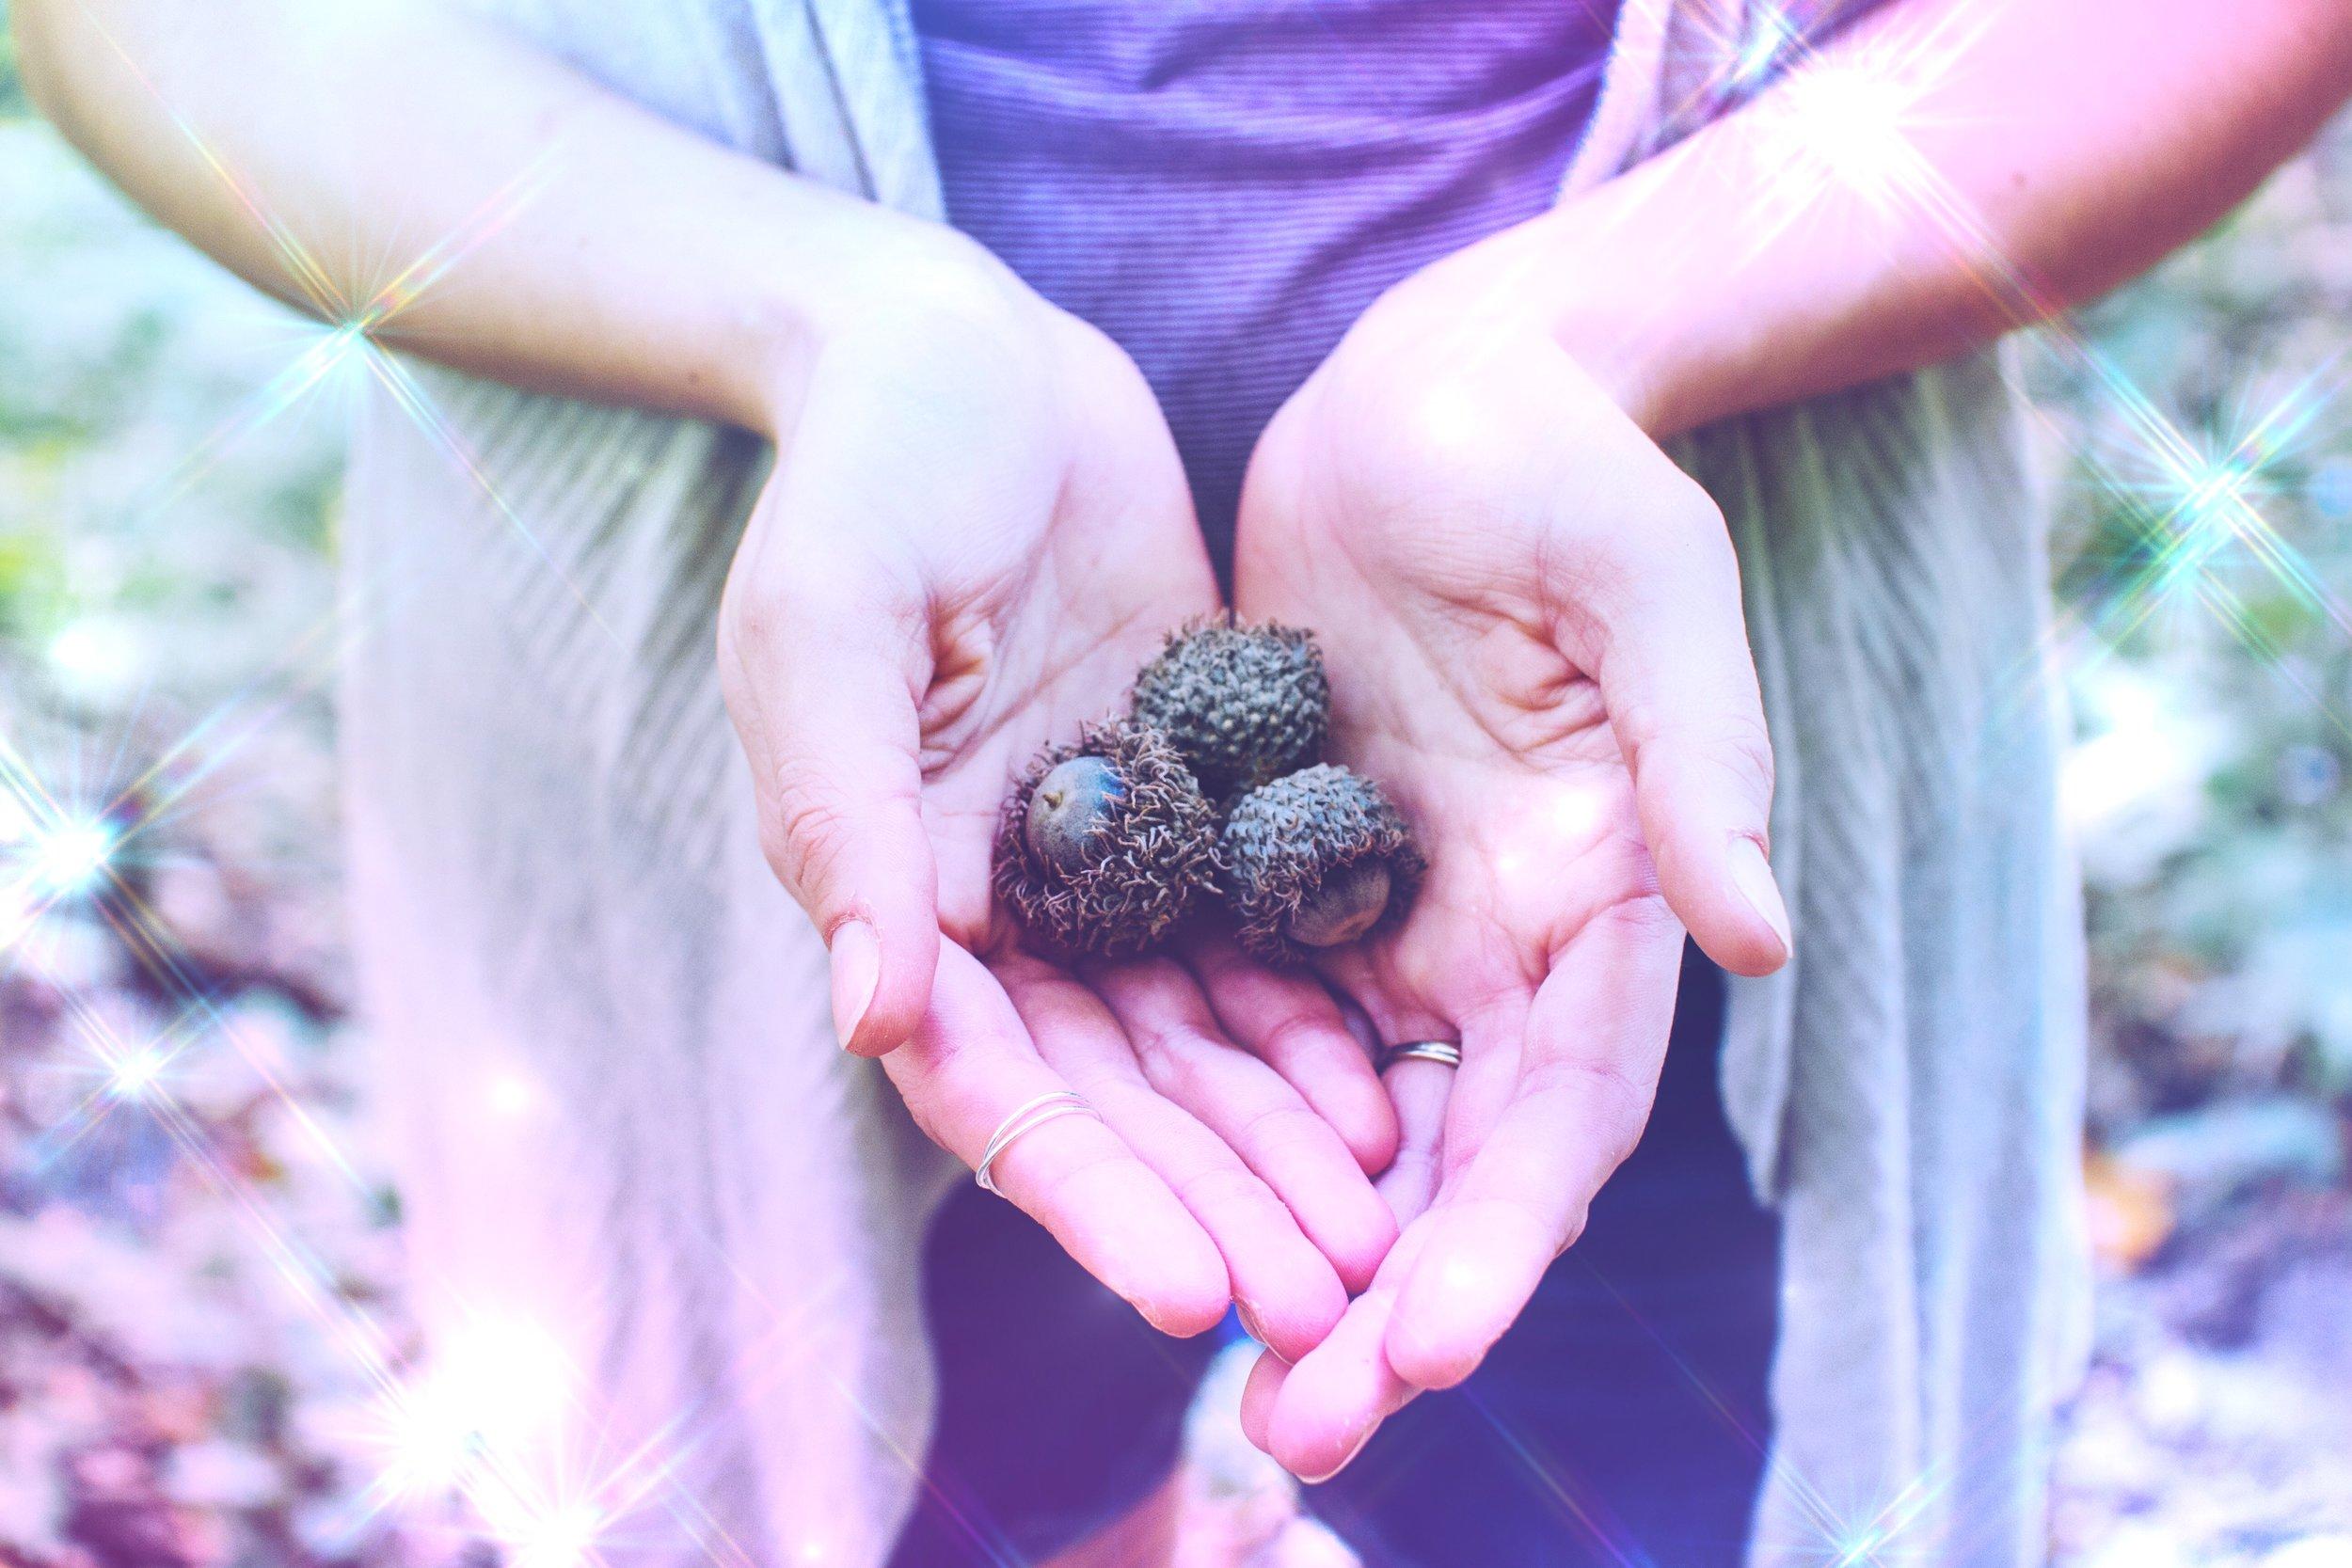 Cultivating Gratitude | Acts of Service | Spirit de la Lune